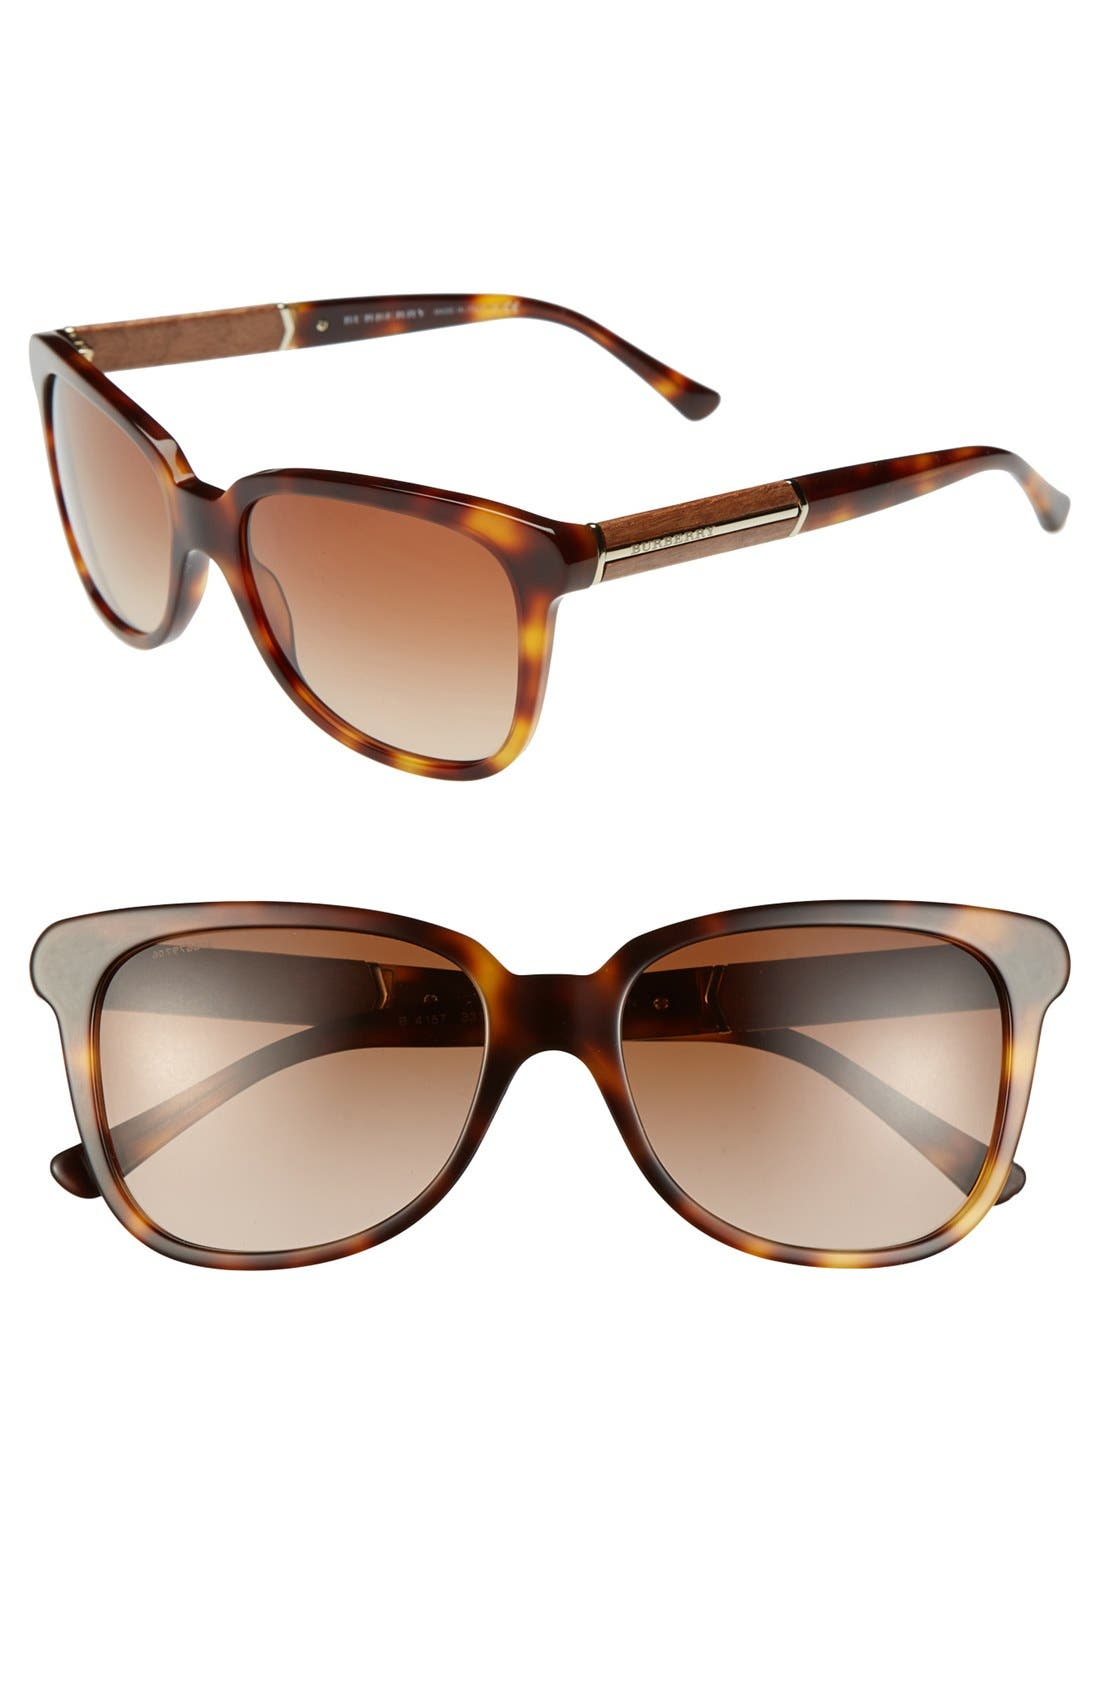 Main Image - Burberry Square 56mm Sunglasses